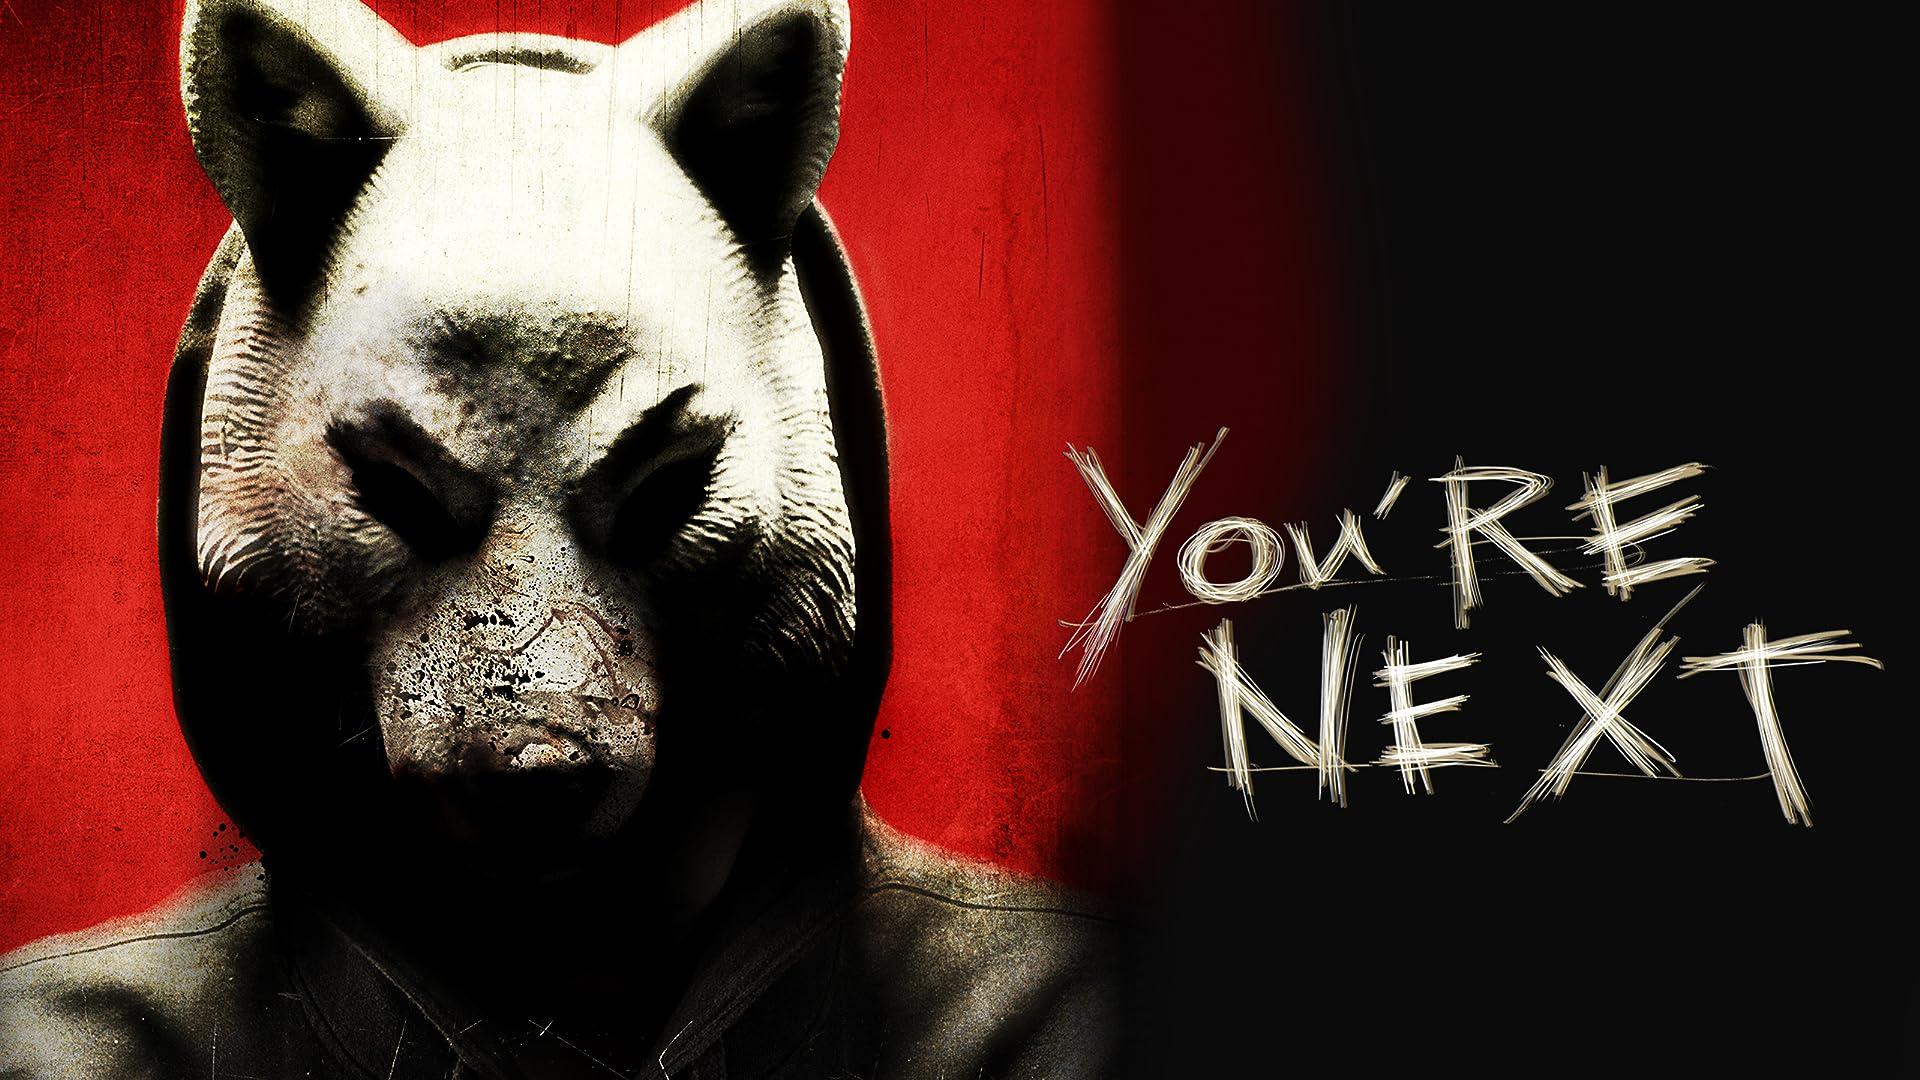 You're Next'